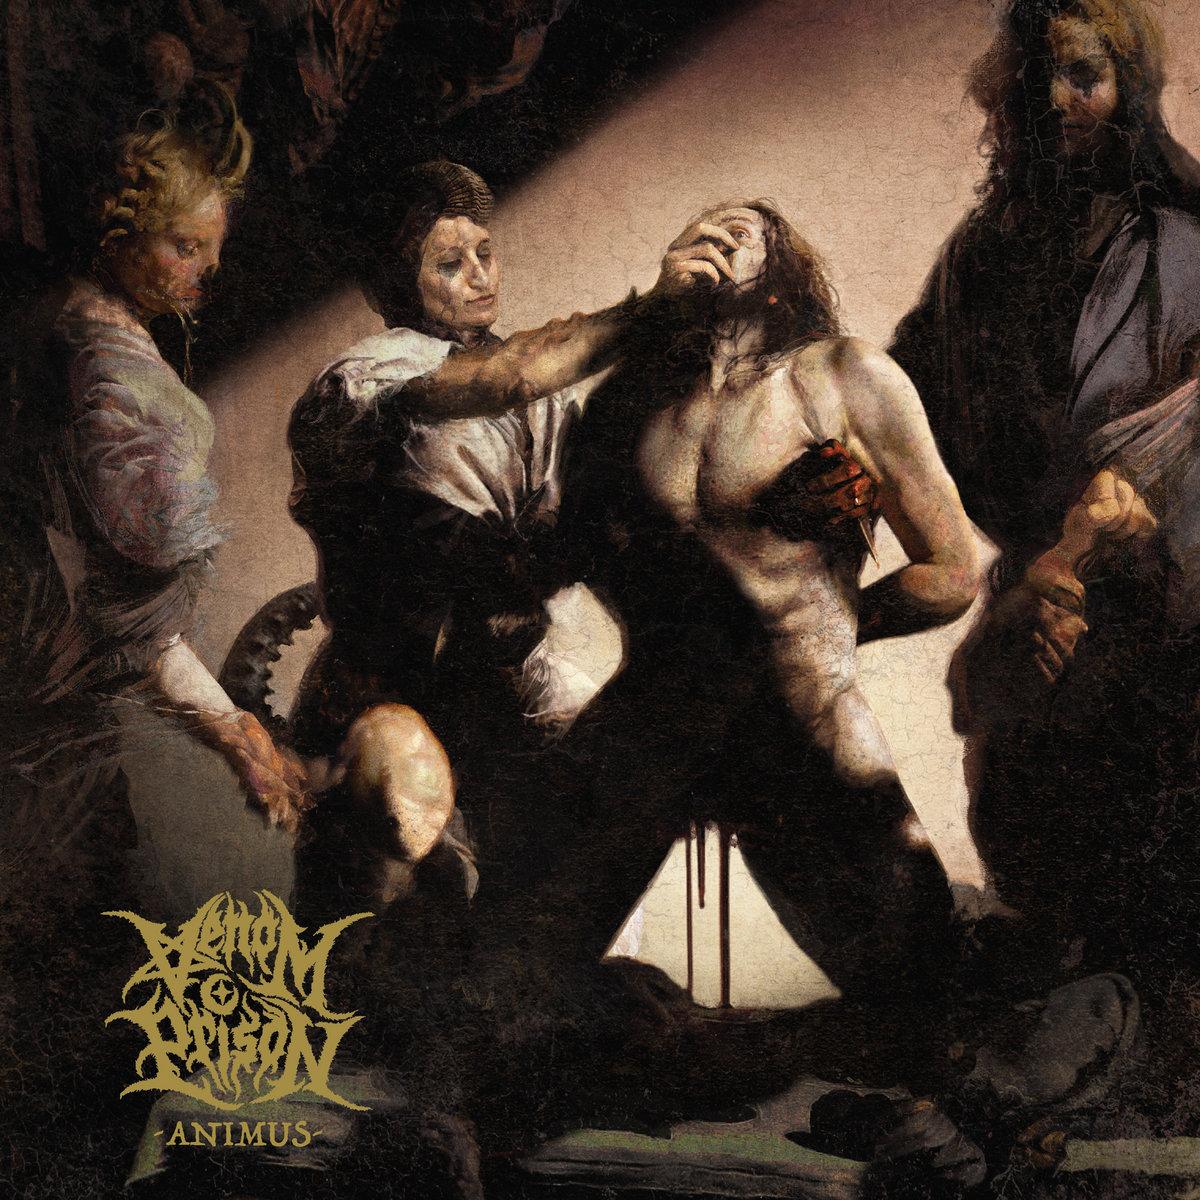 Venom Prison - Animus LP